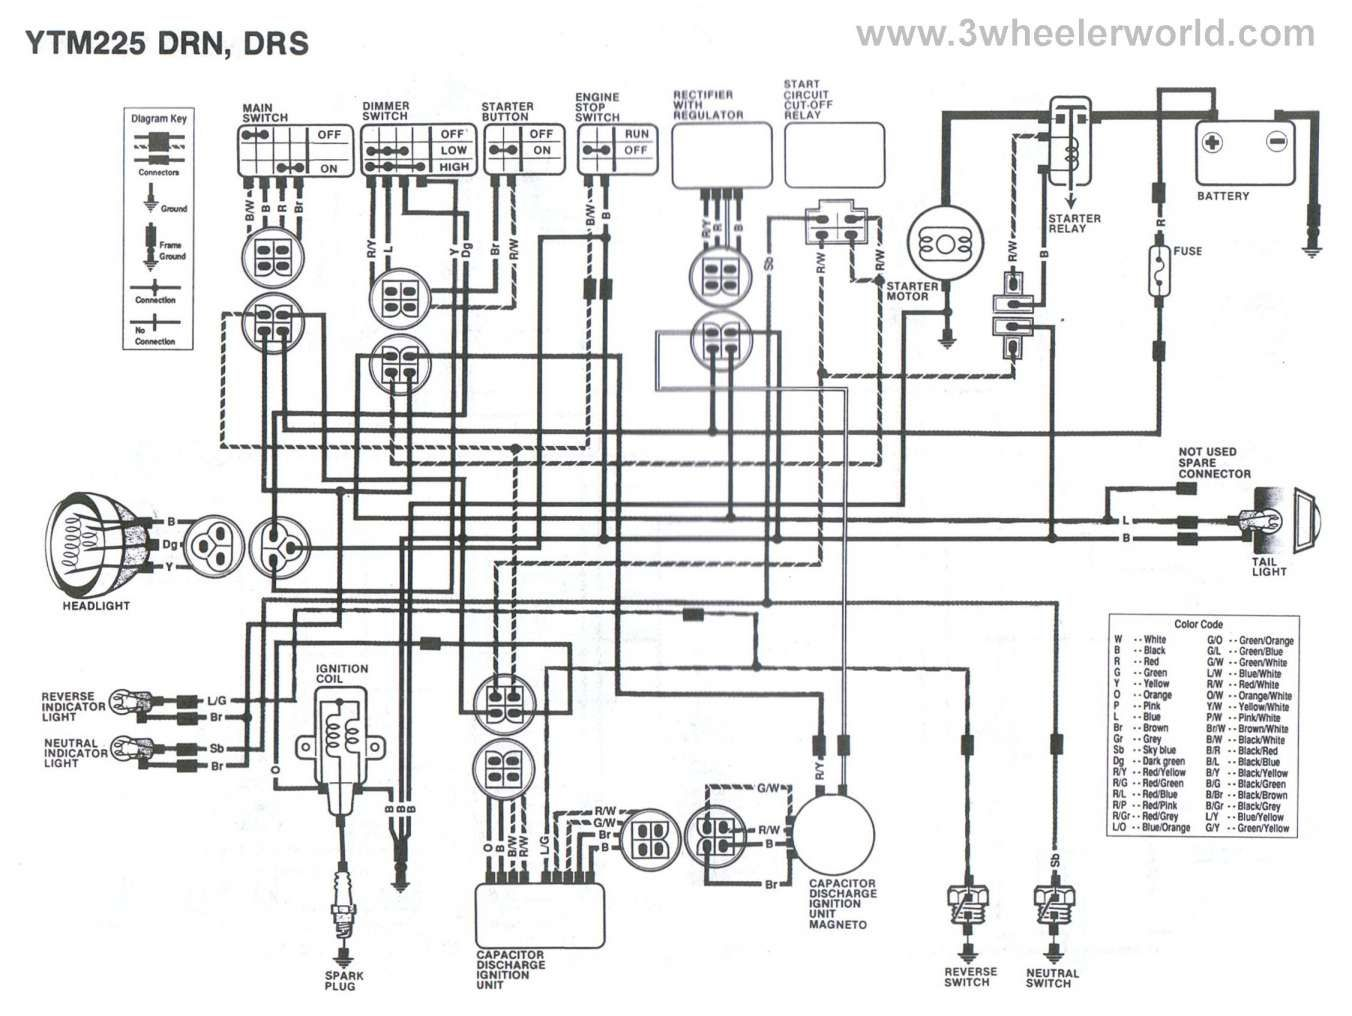 17  Yamaha Rs 100 Motorcycle Wiring Diagram - Motorcycle Diagram